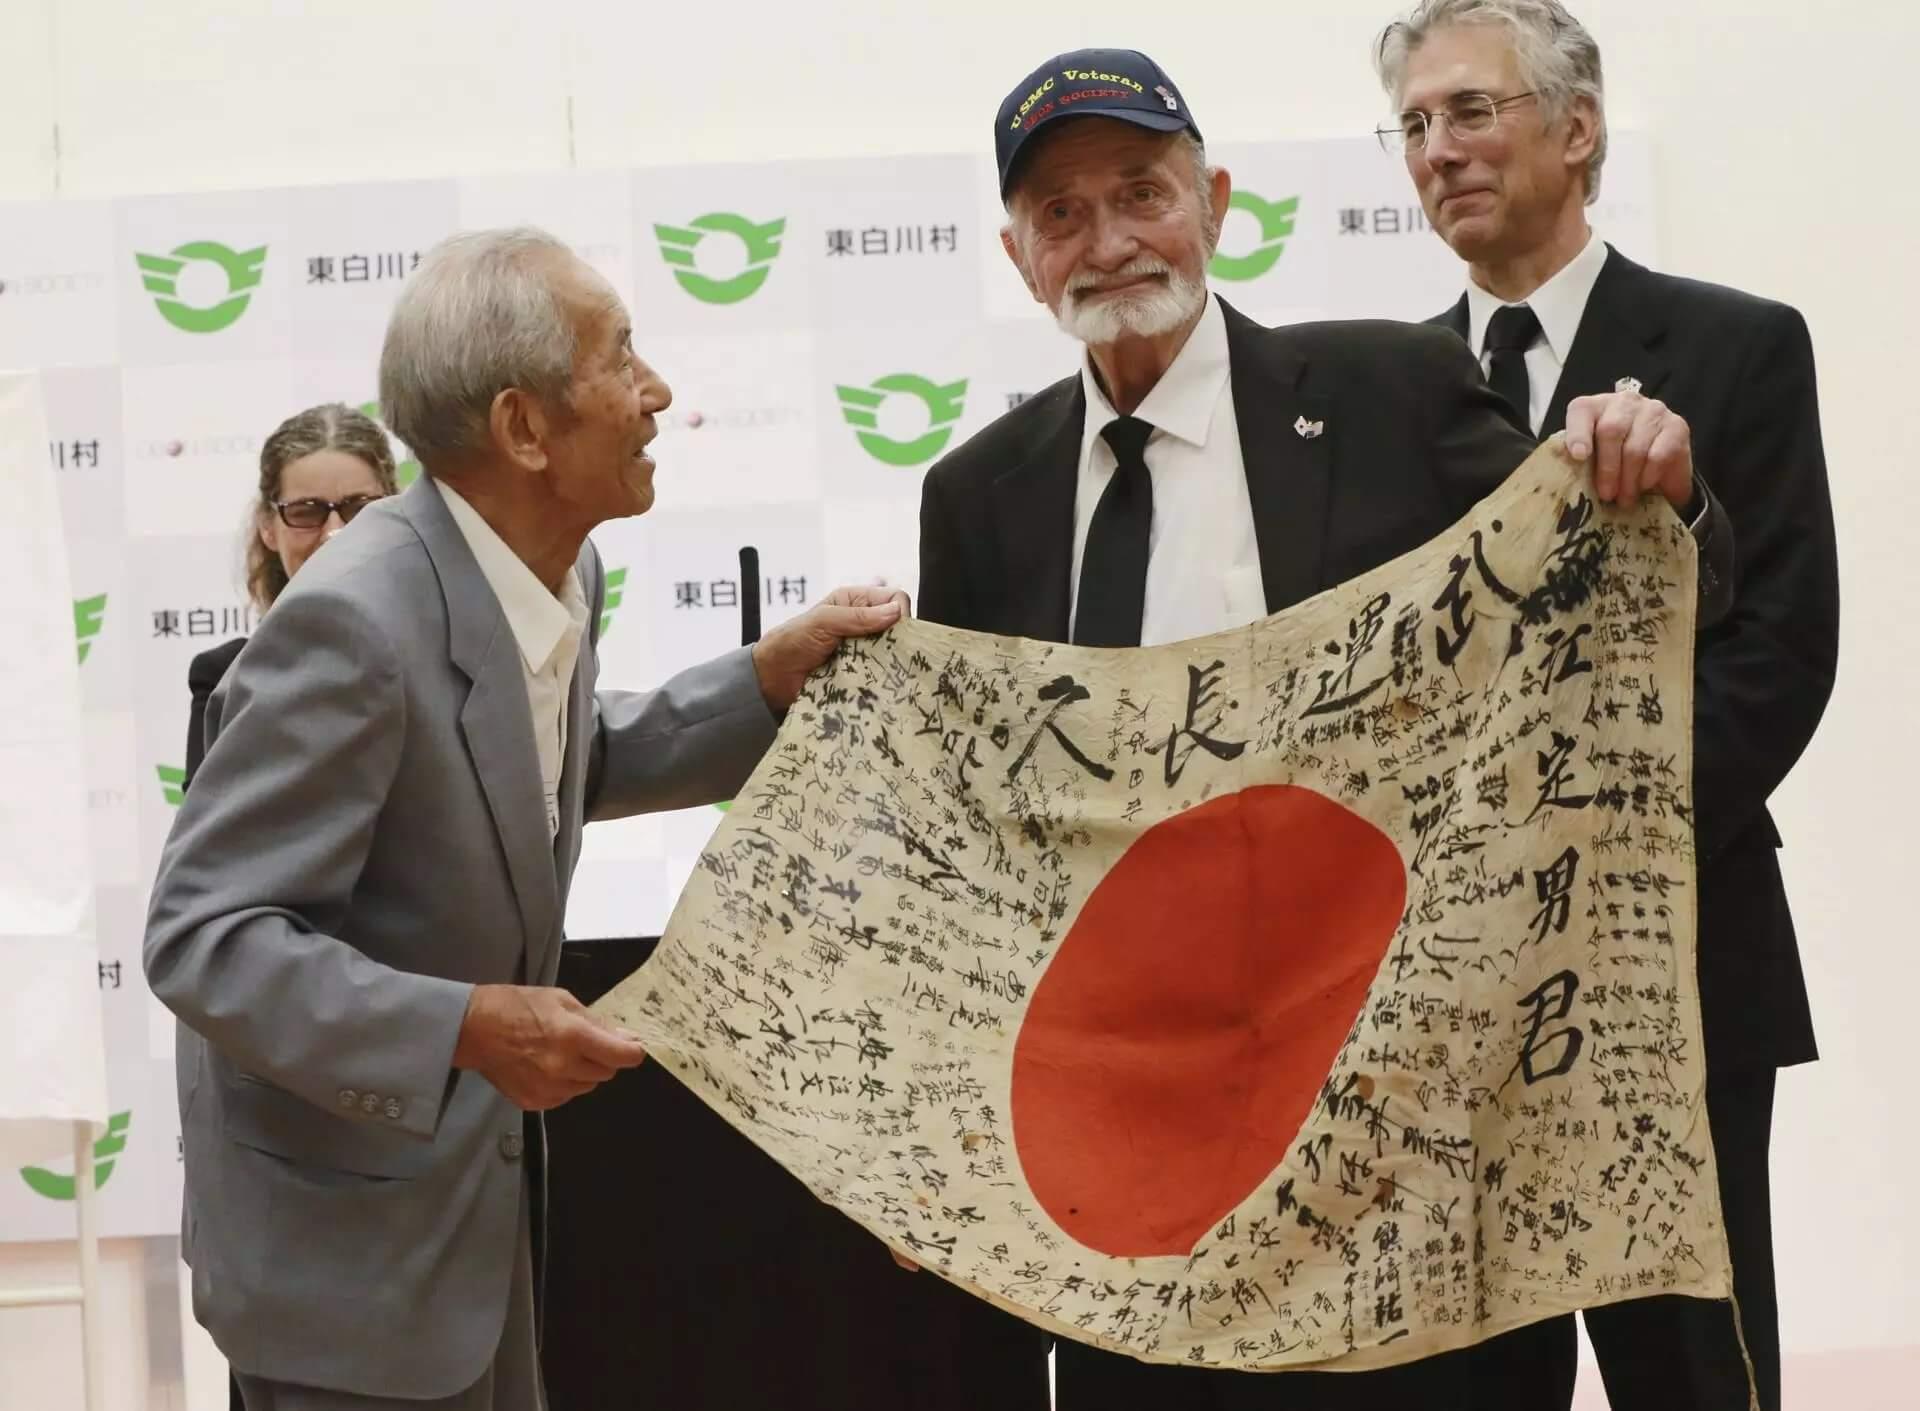 ww2_veteran_returns_japan_flag_to_dead_soldier_fam (3)